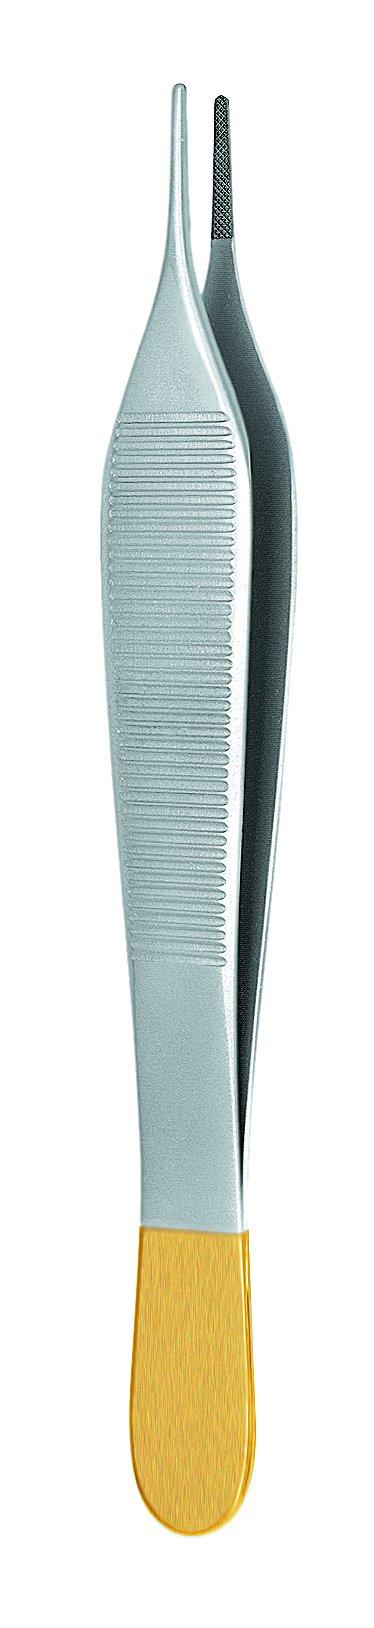 Hu-Friedy TP5042 Adson Perma Sharp Tissue Plier, 1 x 2